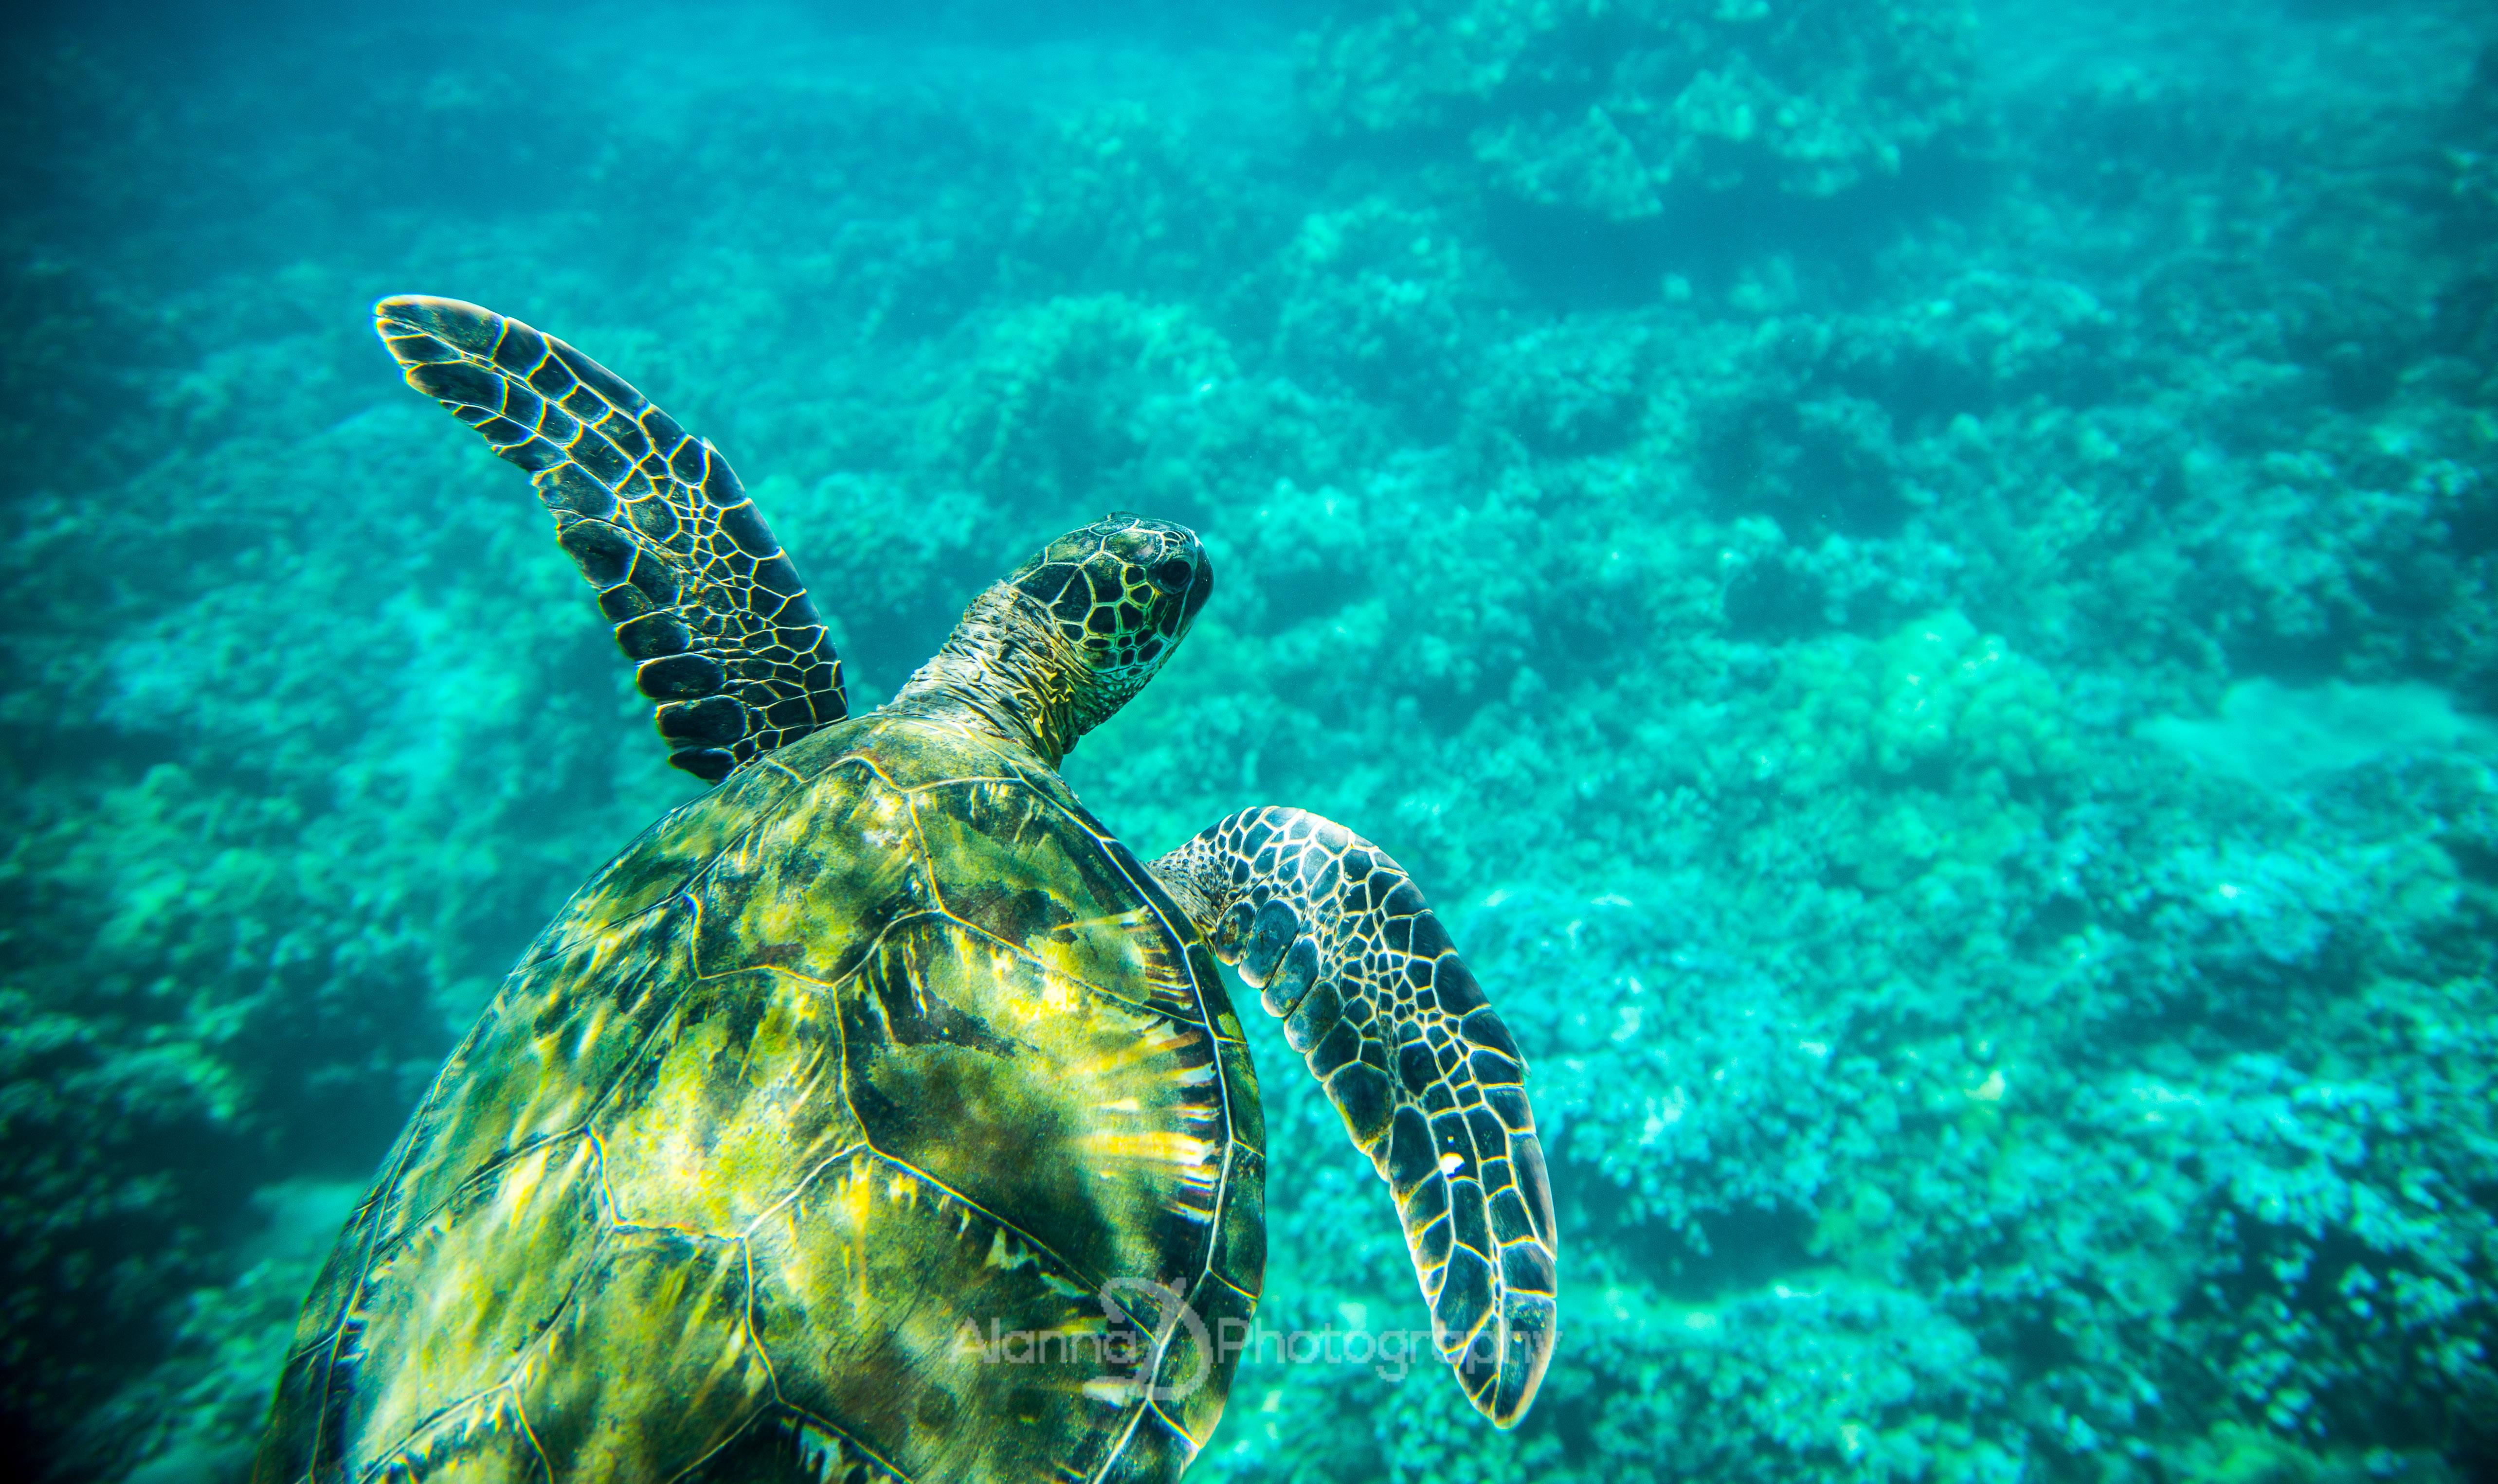 Green Sea Turtle Maui - Alanna D Photography